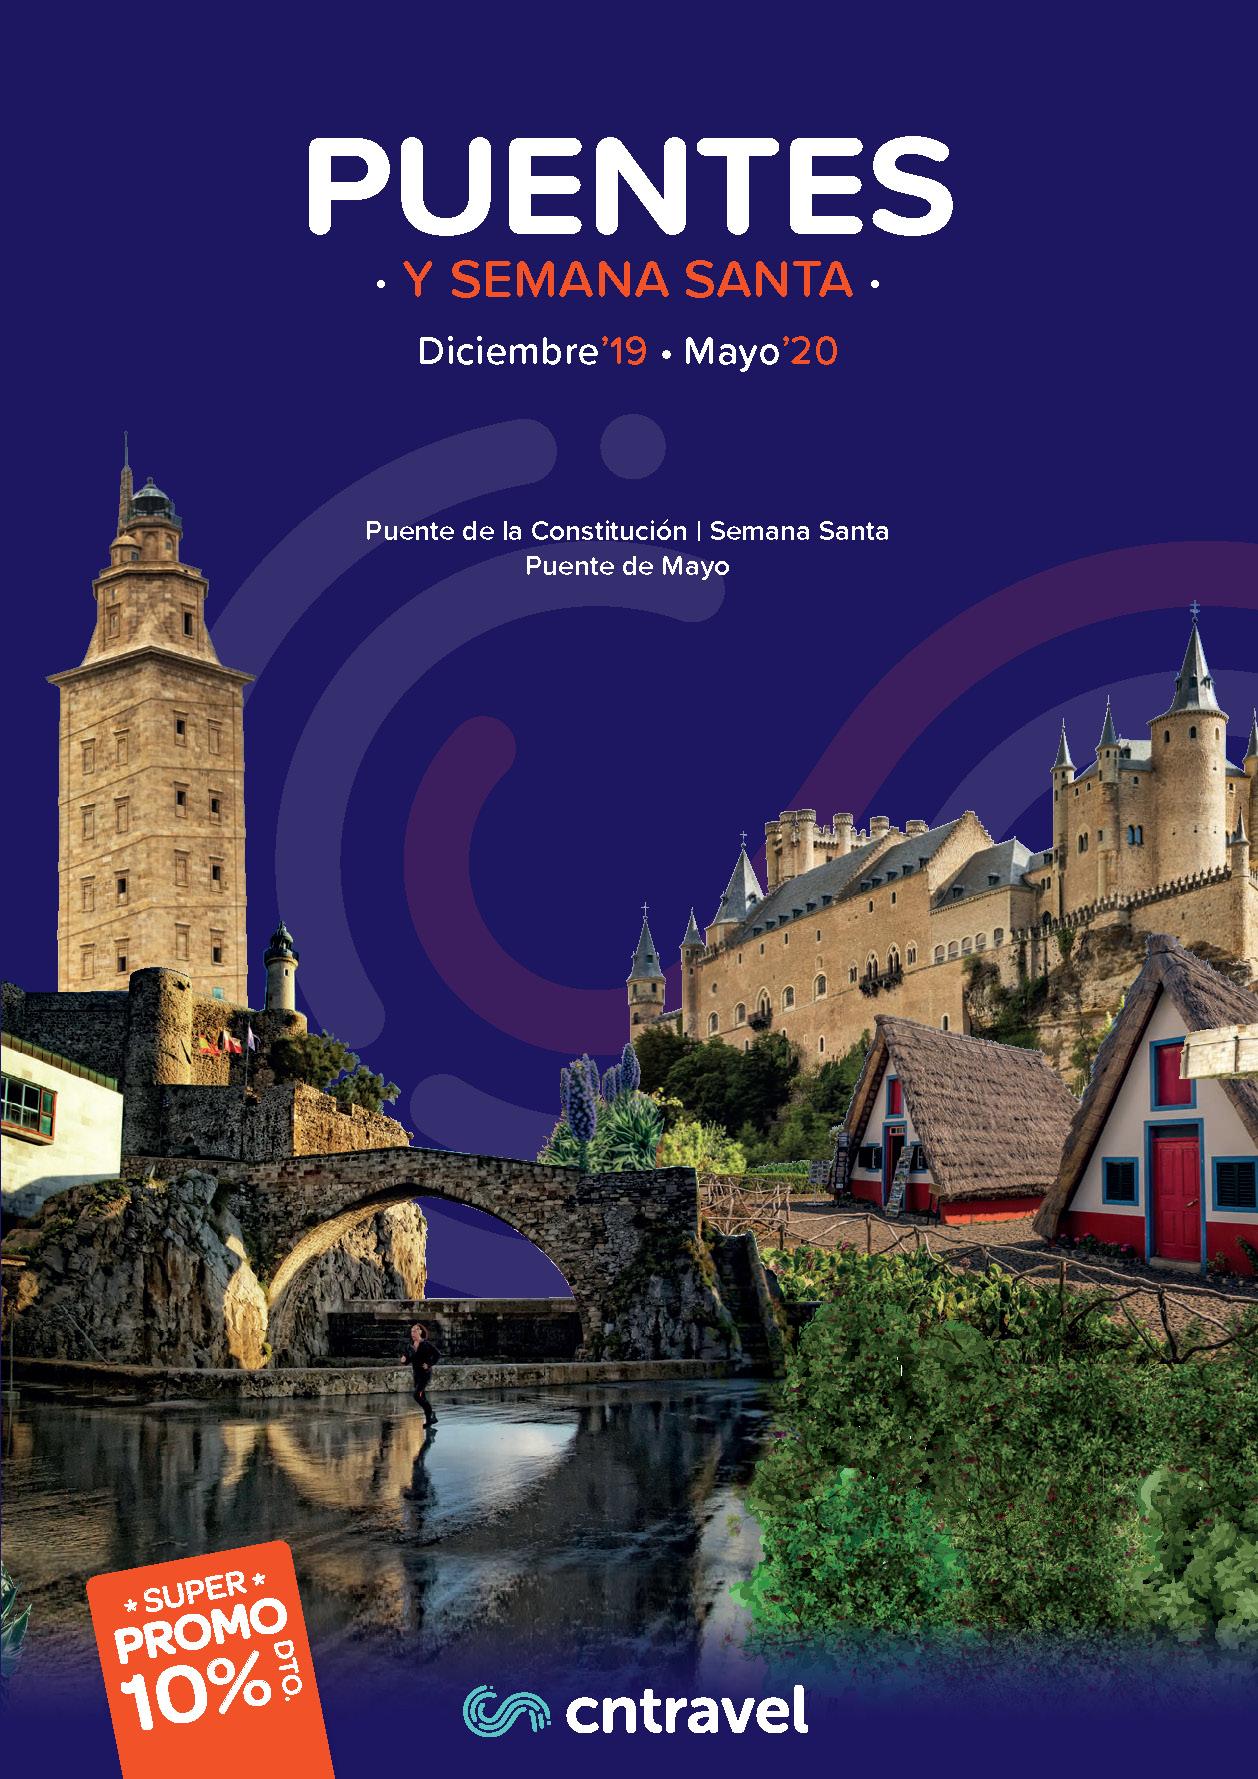 Catalogo CN Travel Puentes 2019-2020 salidas Levante Murcia Albacete